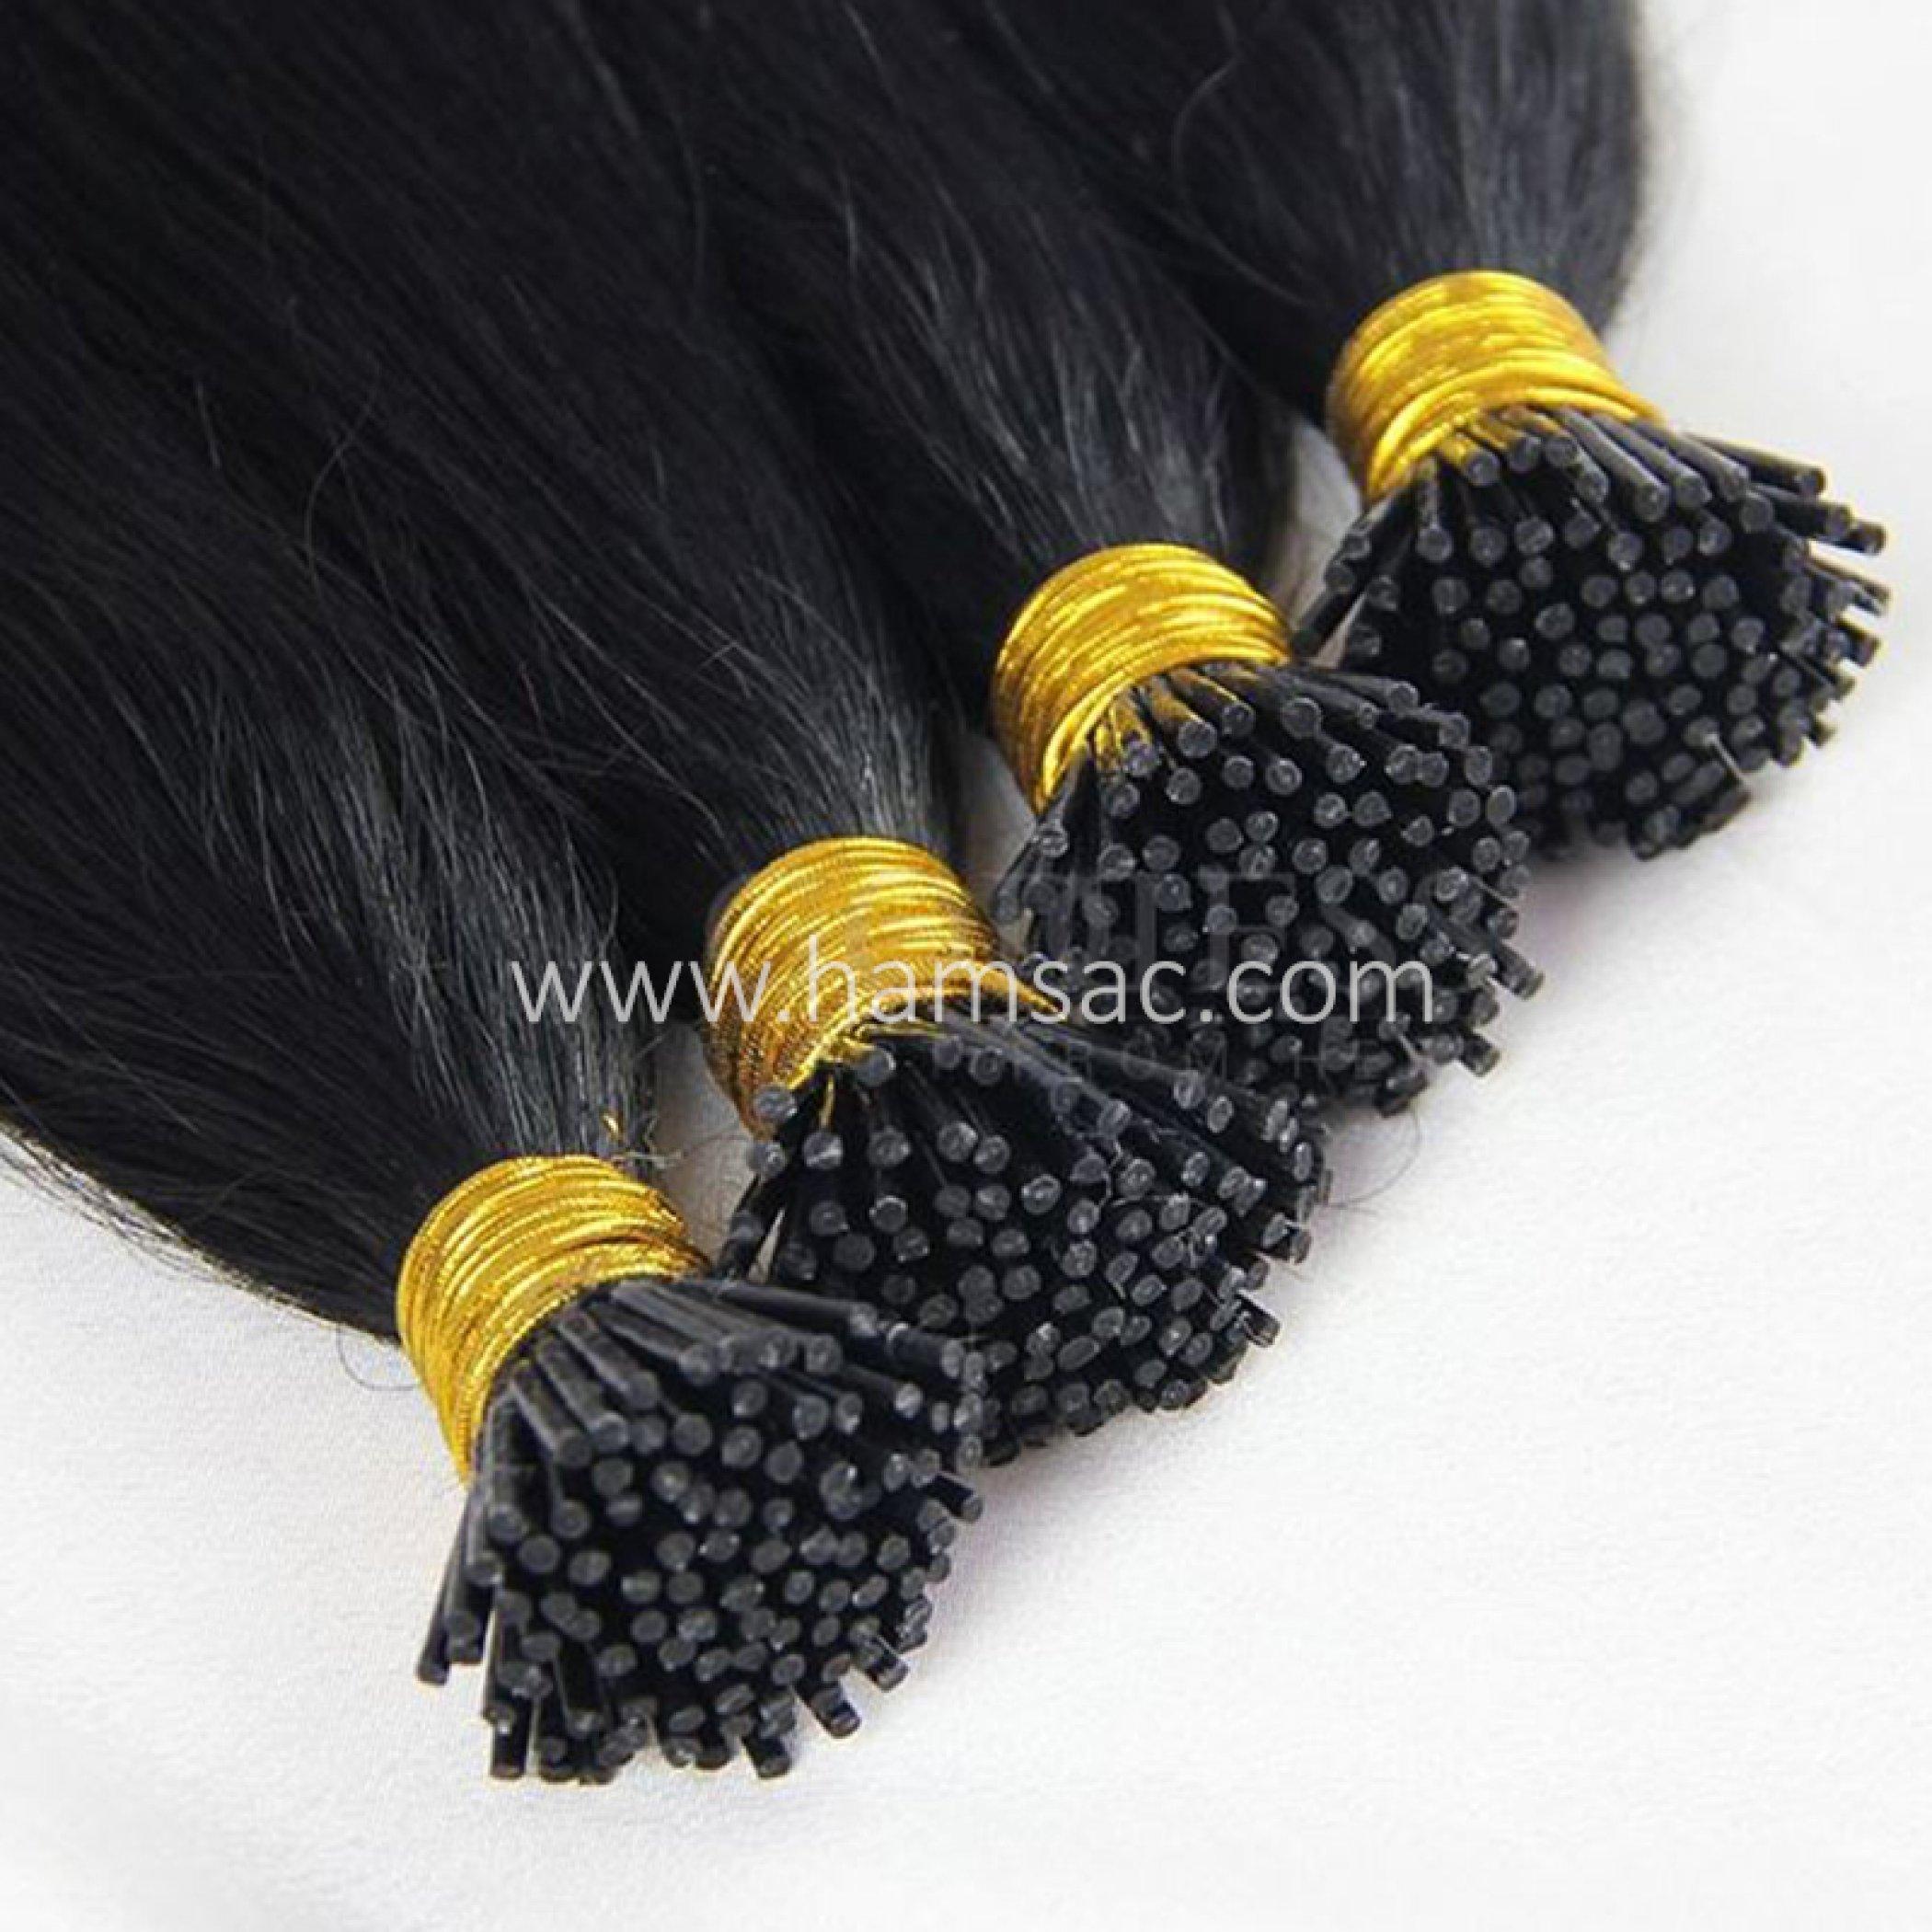 75 cm Doğal Boncuk Kaynak Saç